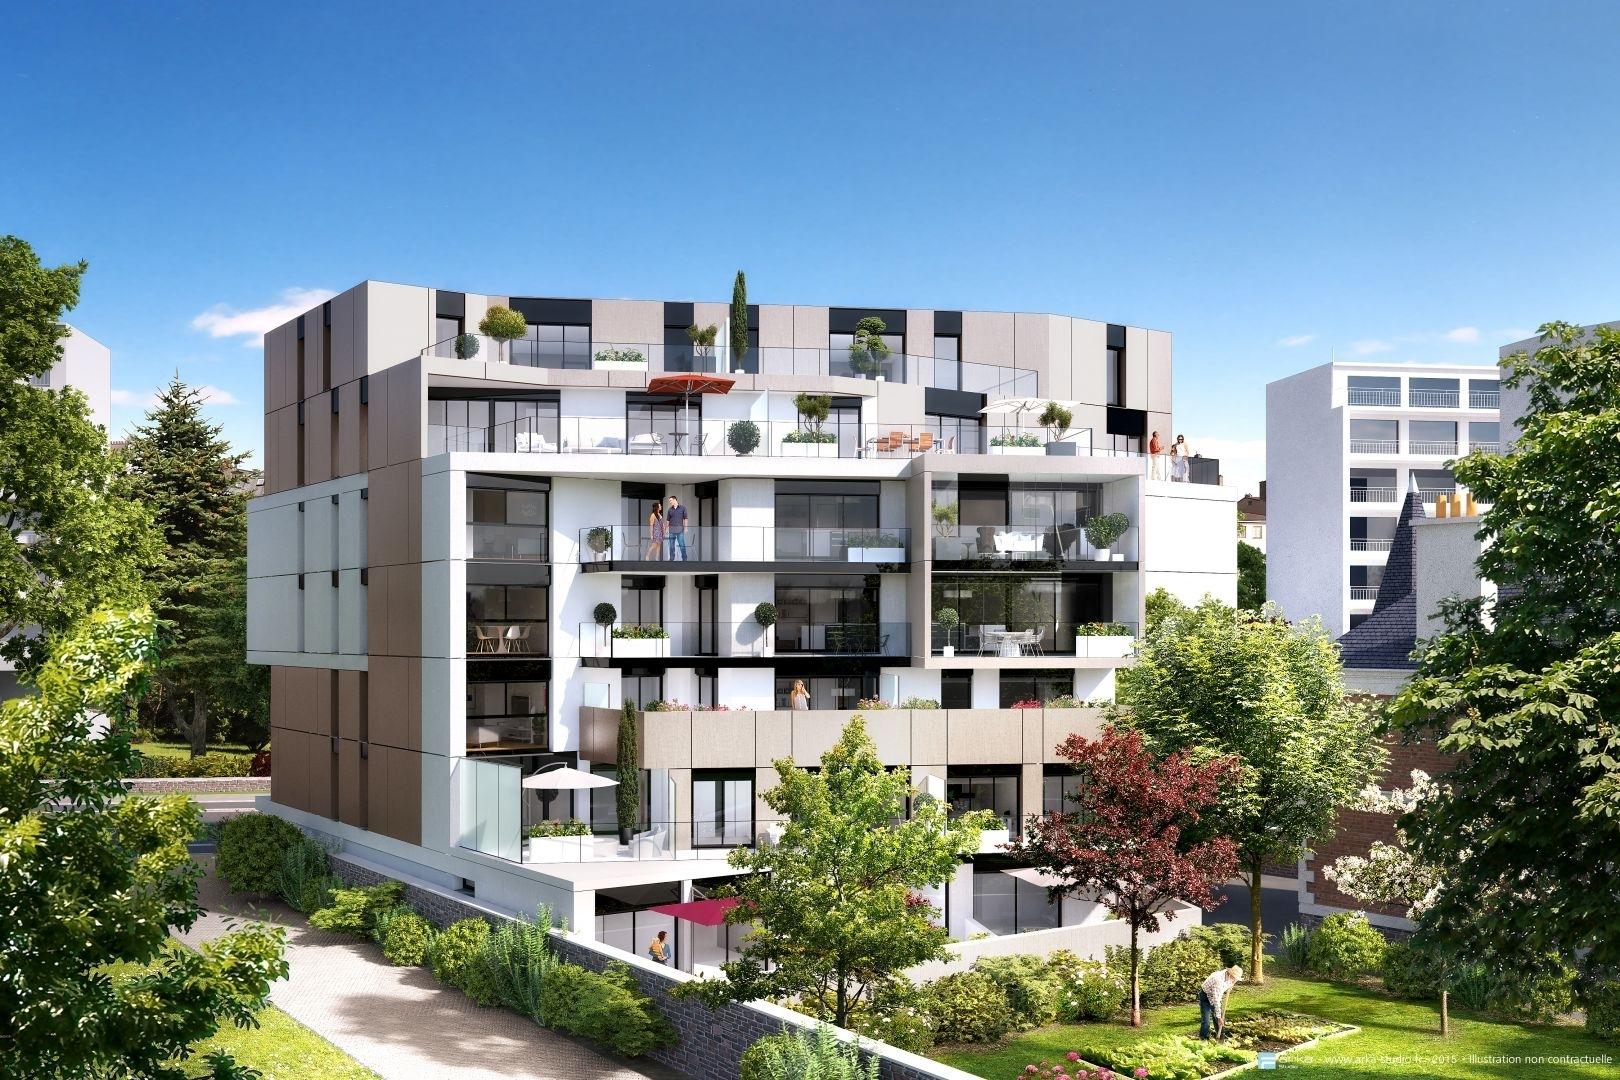 Programme immobilier le 84 thabor sevigne rennes 36 for Residence neuf